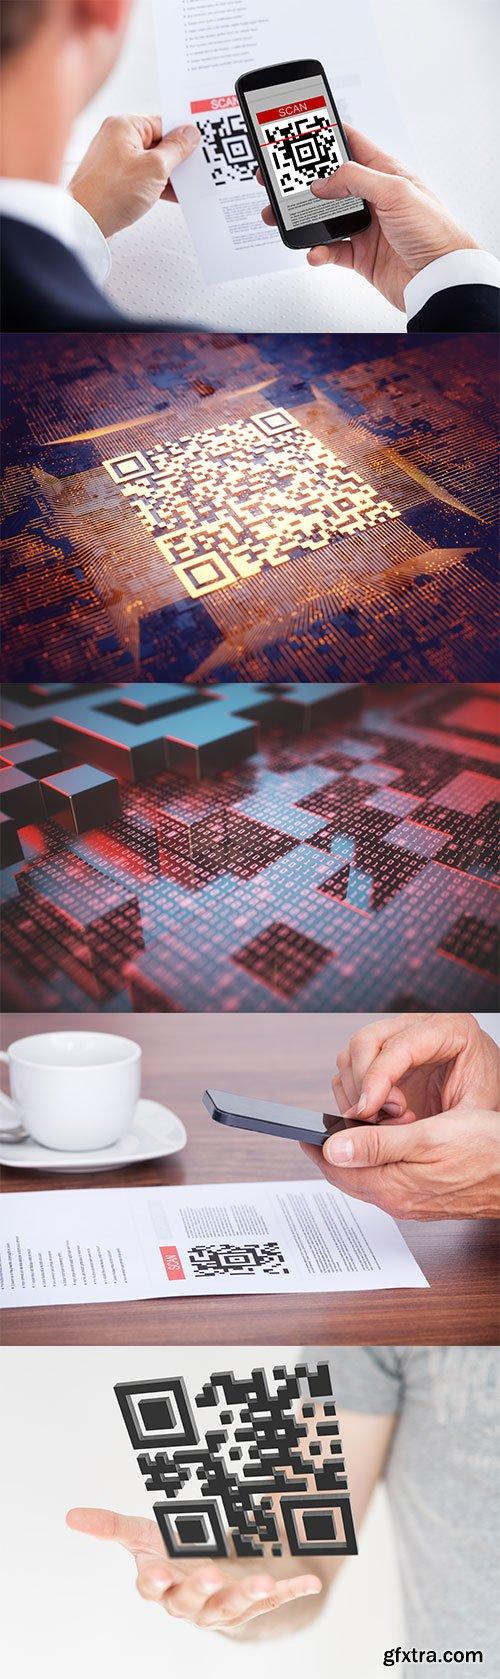 Photo - Data Matrix Reader - 5xJPGs